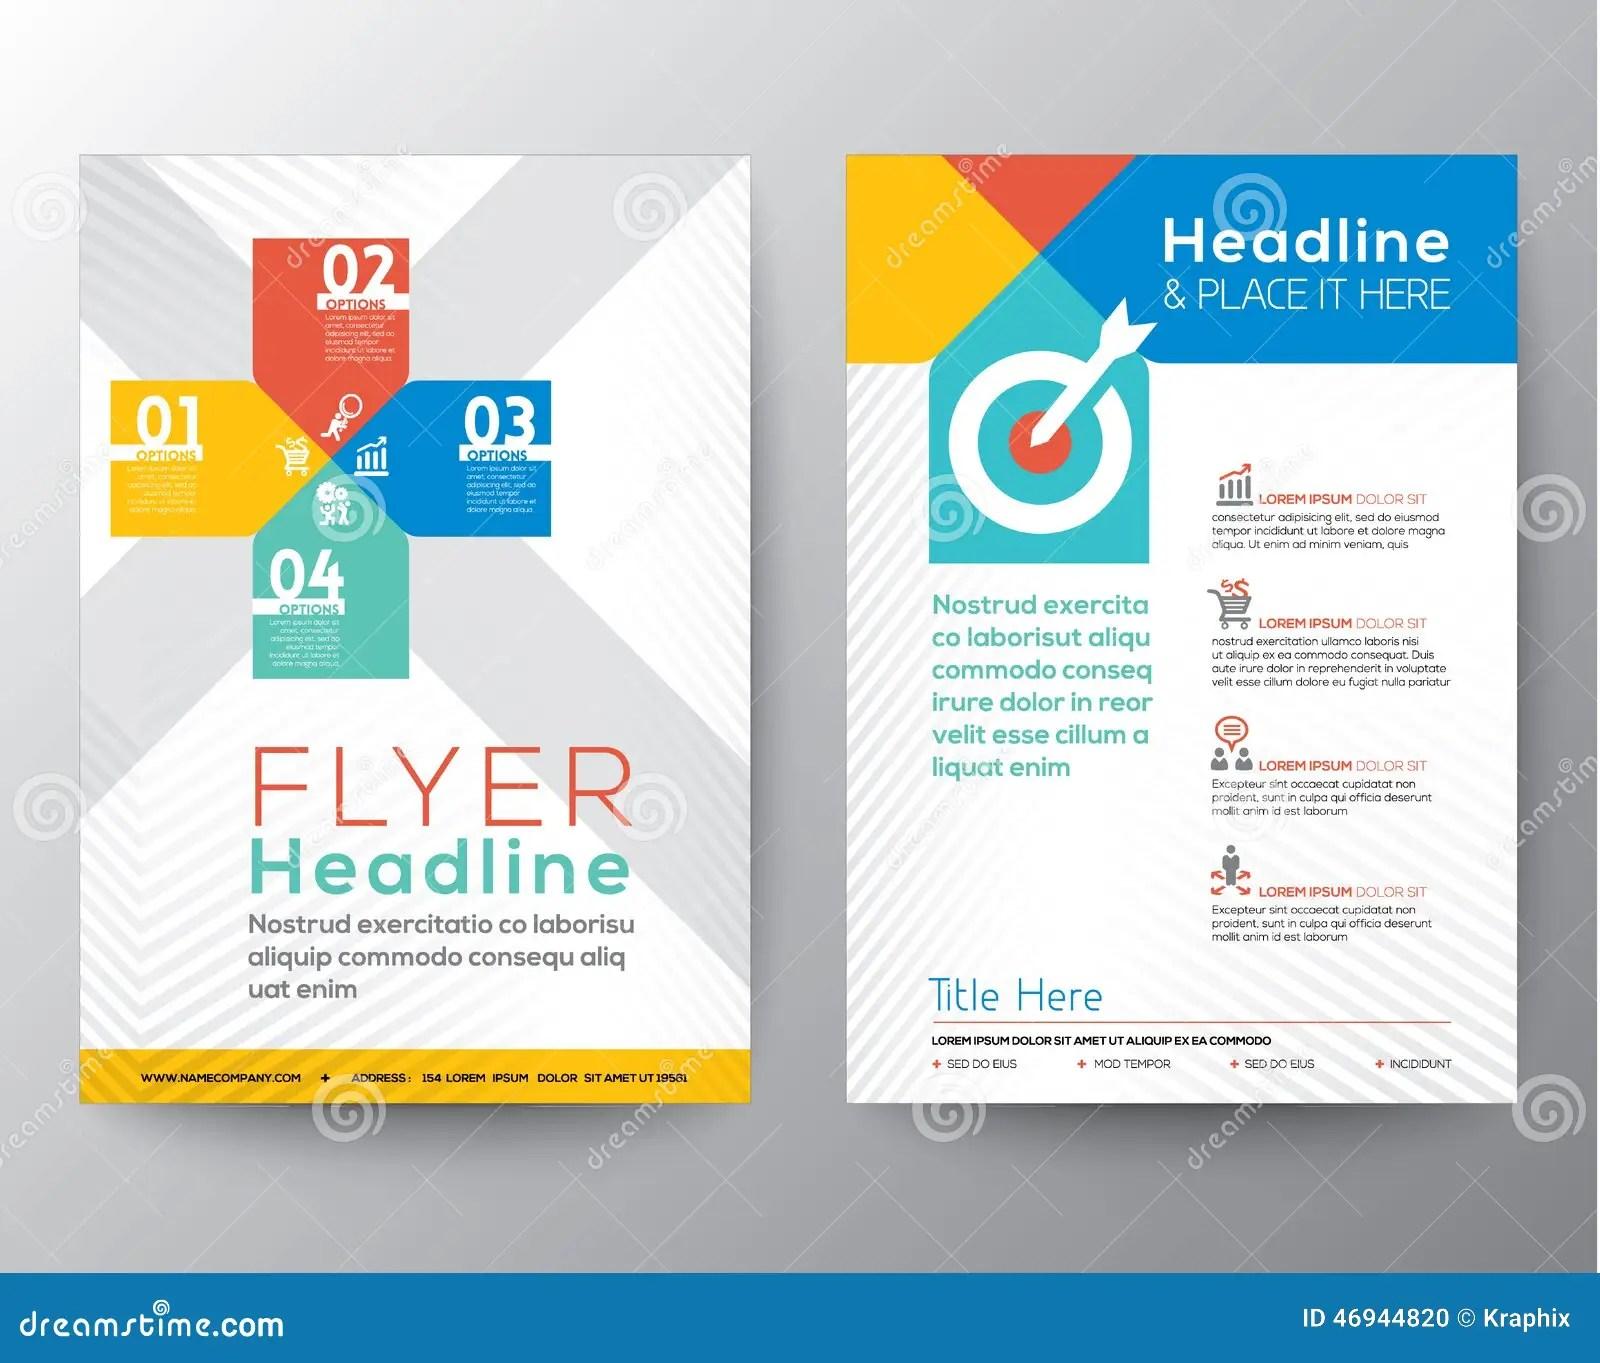 Graphic designs business plan